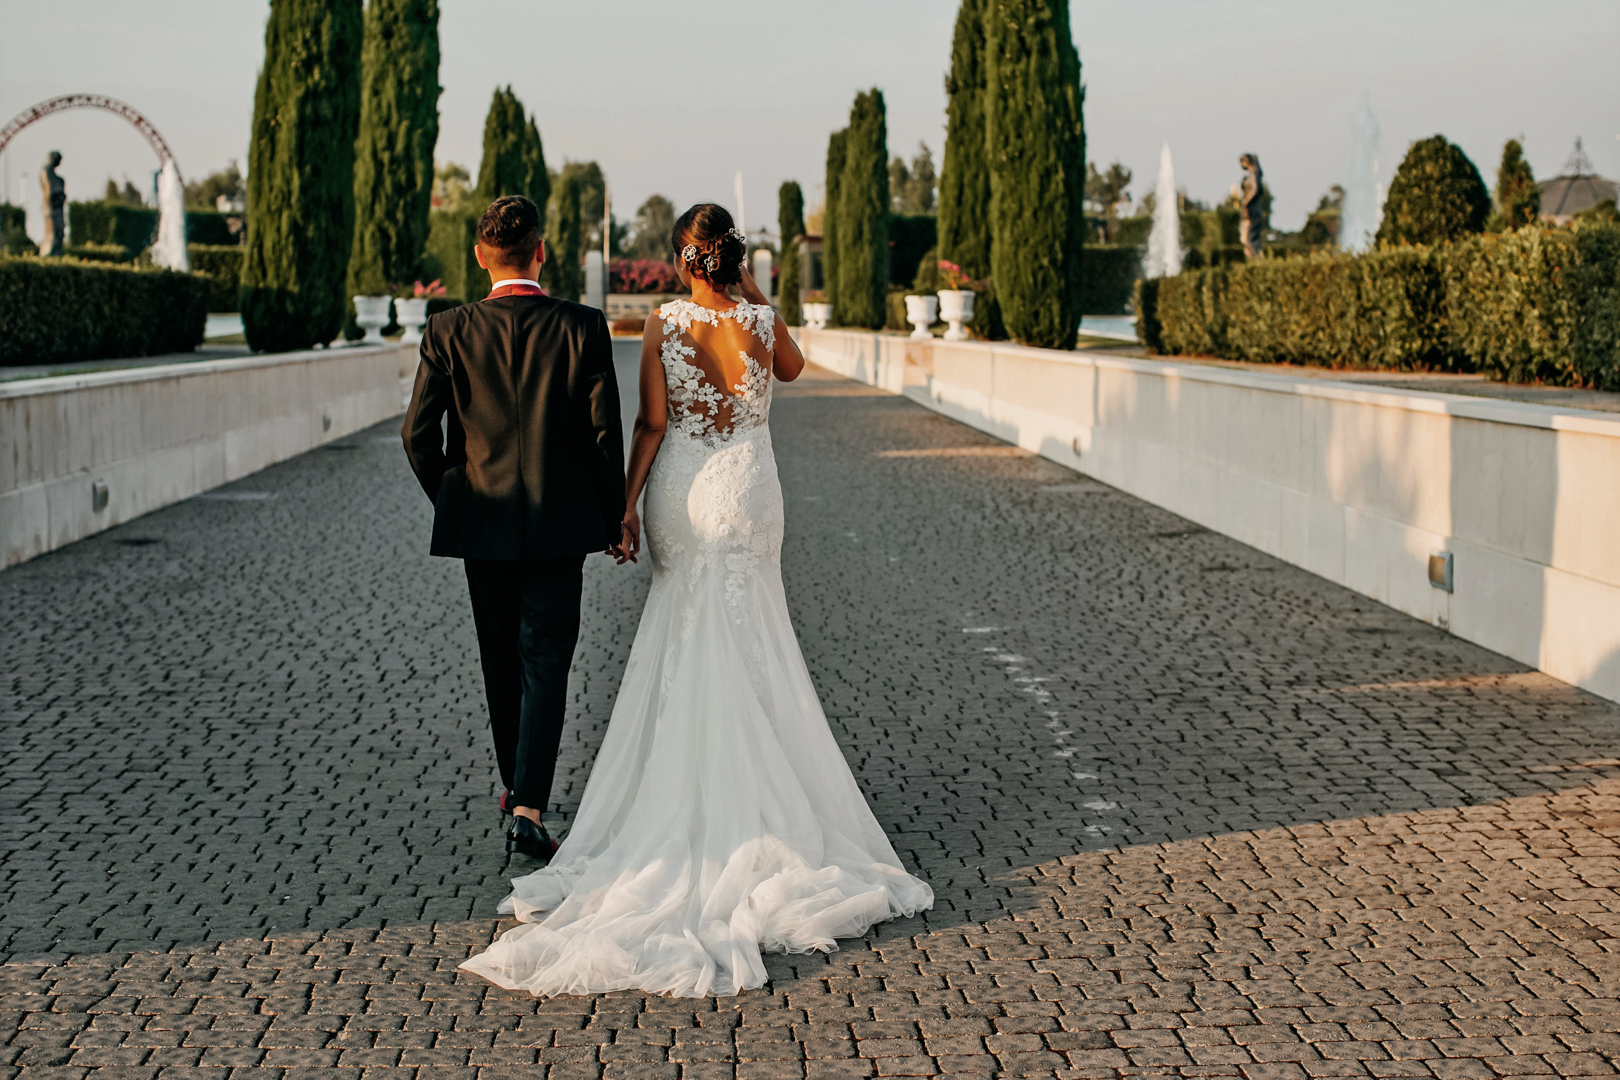 57 gianni-lepore-sposi-molfetta-new-lions-esterna-matrimonio-bride-groom